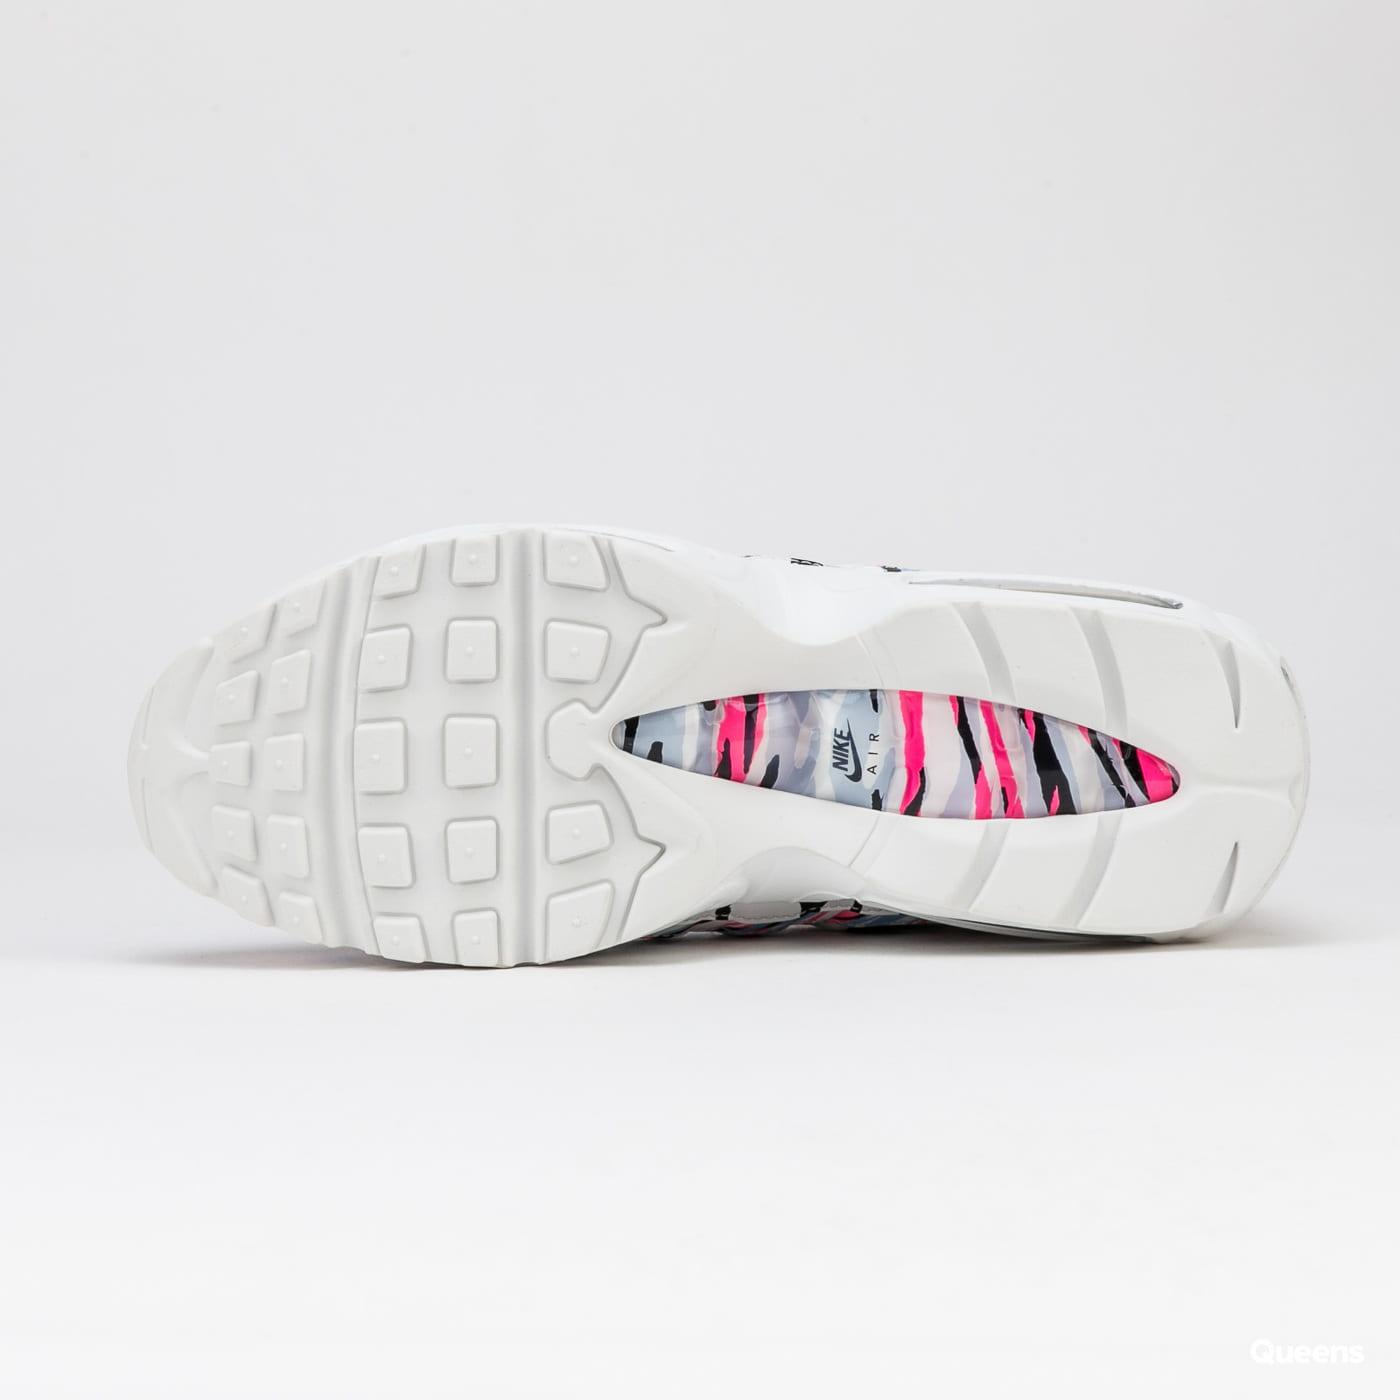 Nike Air Max 95 CTRY summit white / black - royal tint